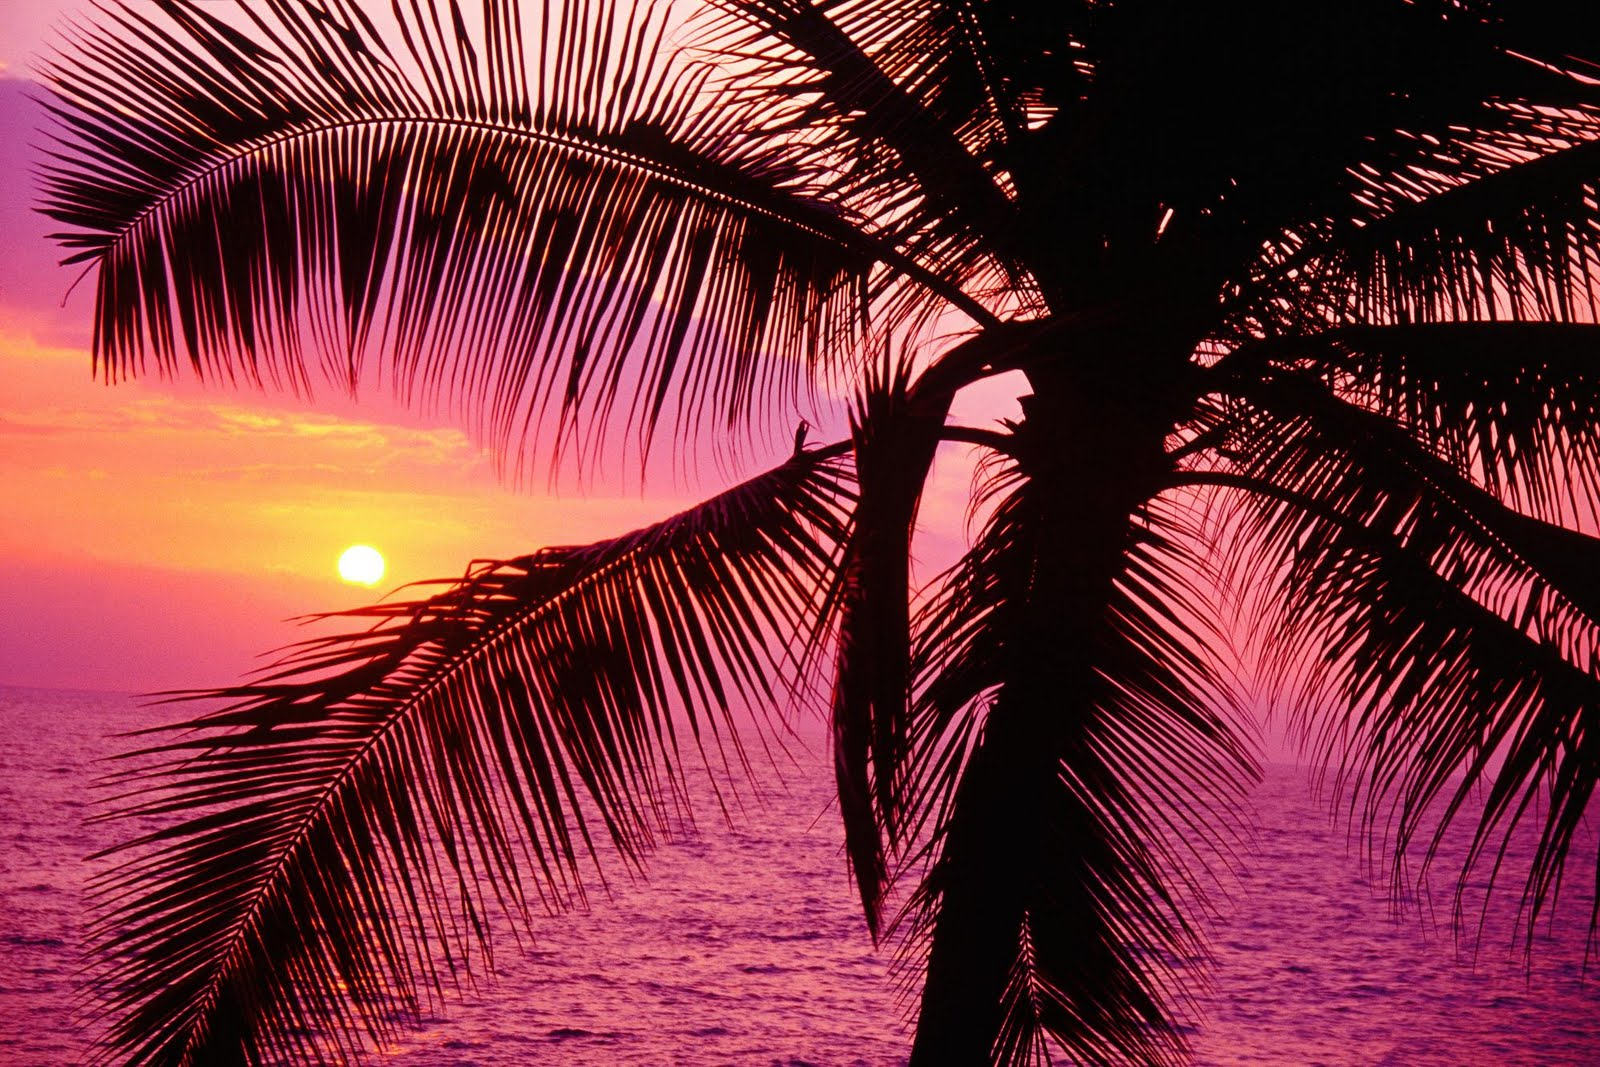 http://1.bp.blogspot.com/-8aMj040CpAo/Tdbbn4qkyrI/AAAAAAAAAVU/_1lv8rjb2Lc/s1600/sunsetmantra+%252820%2529.jpg